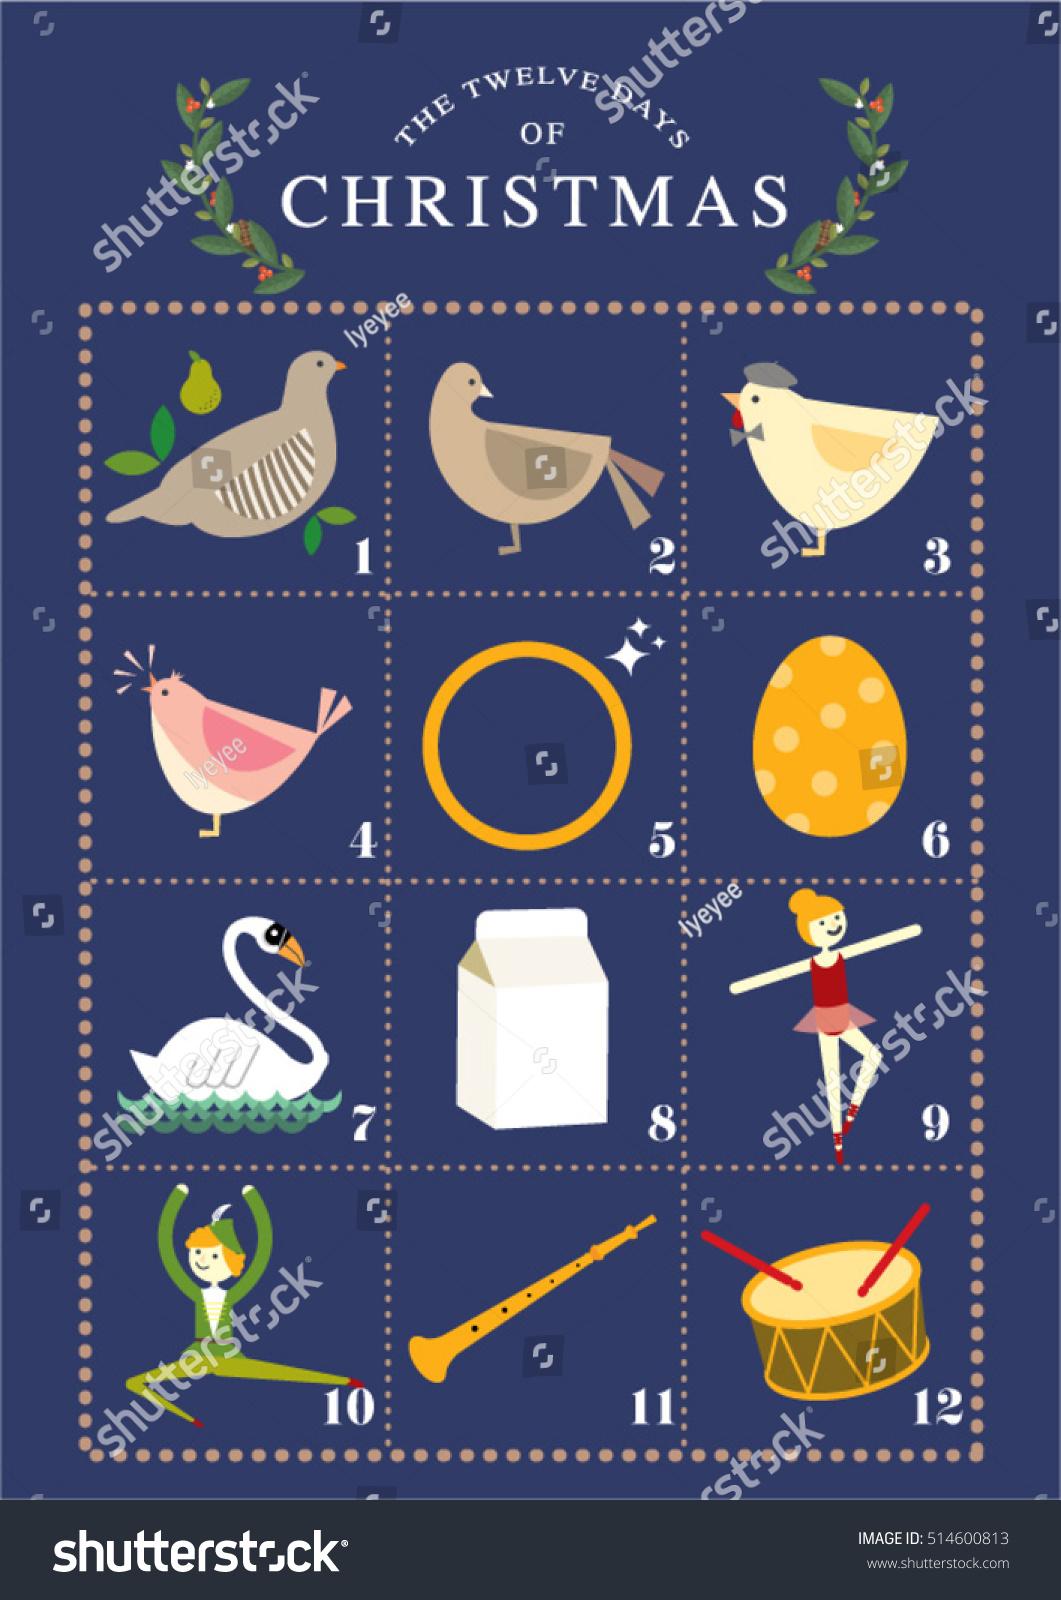 Twelve Days Christmas Template Vectorillustration Stock